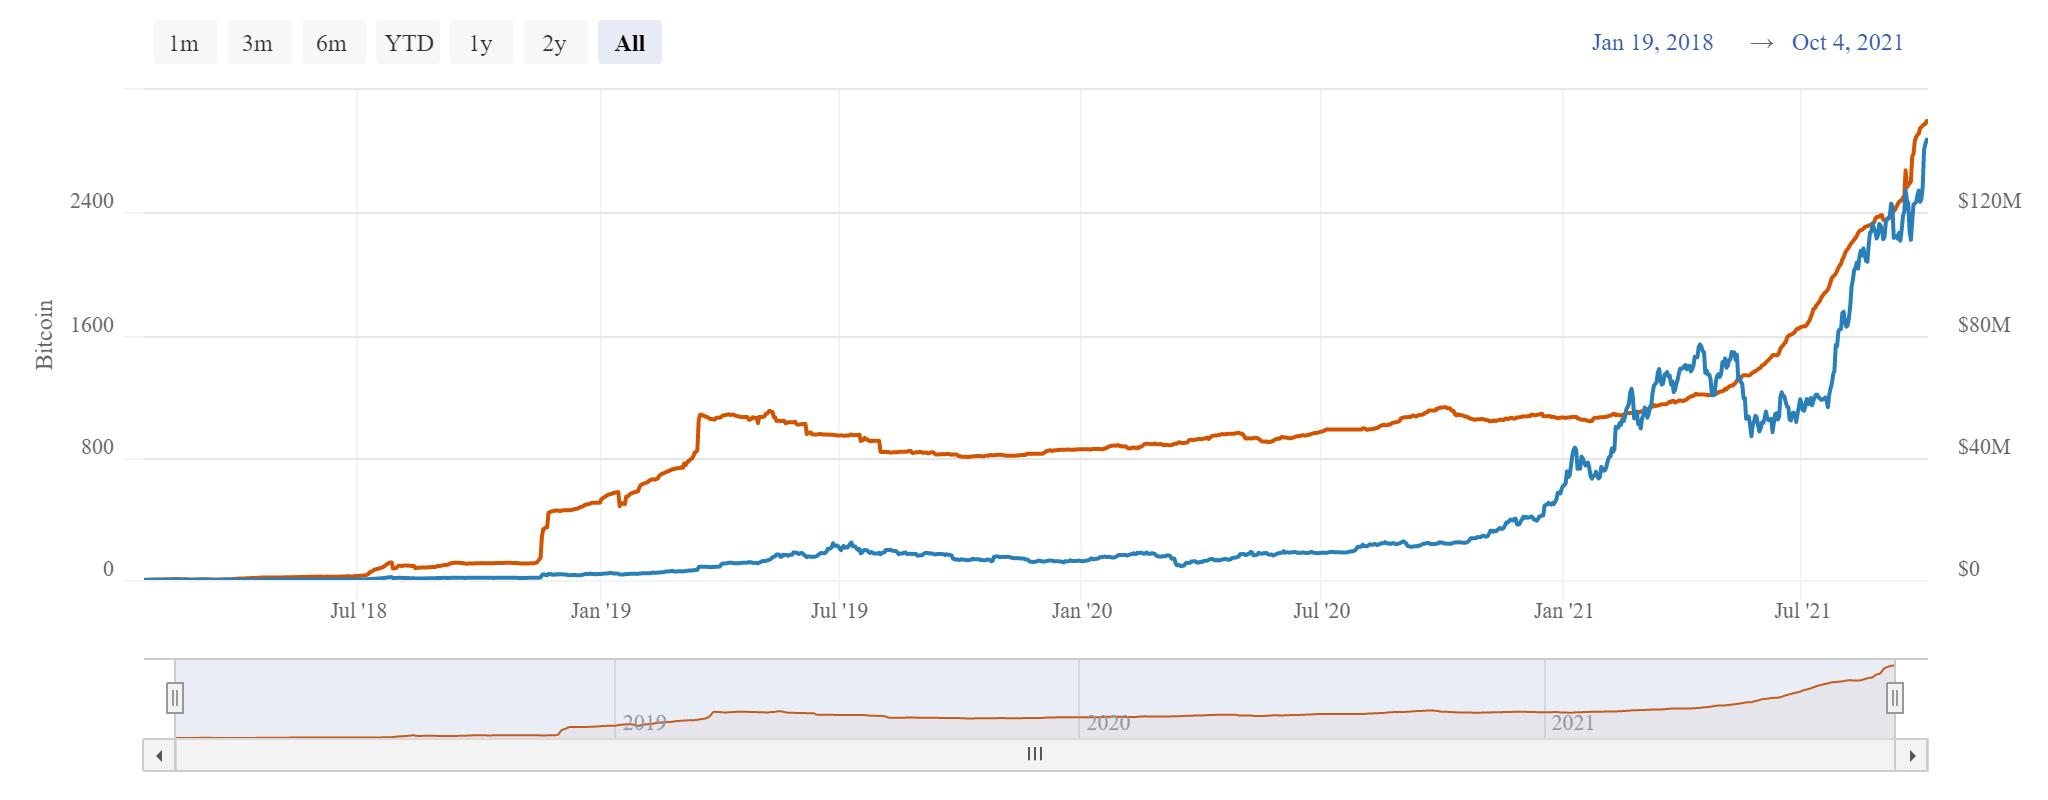 BTC worth more than Facebook